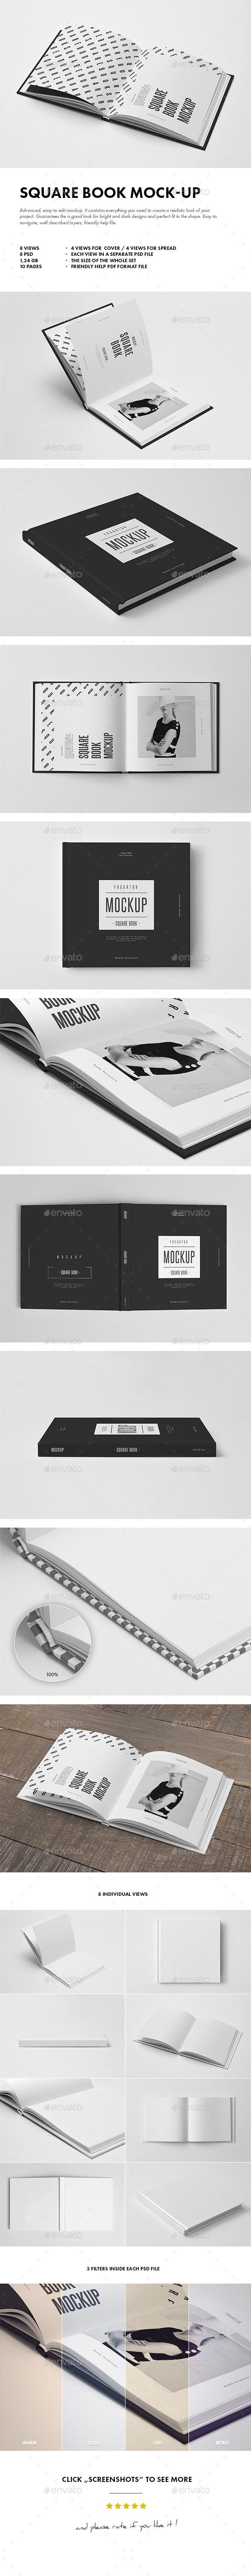 Square Book Mock-up - Books Print